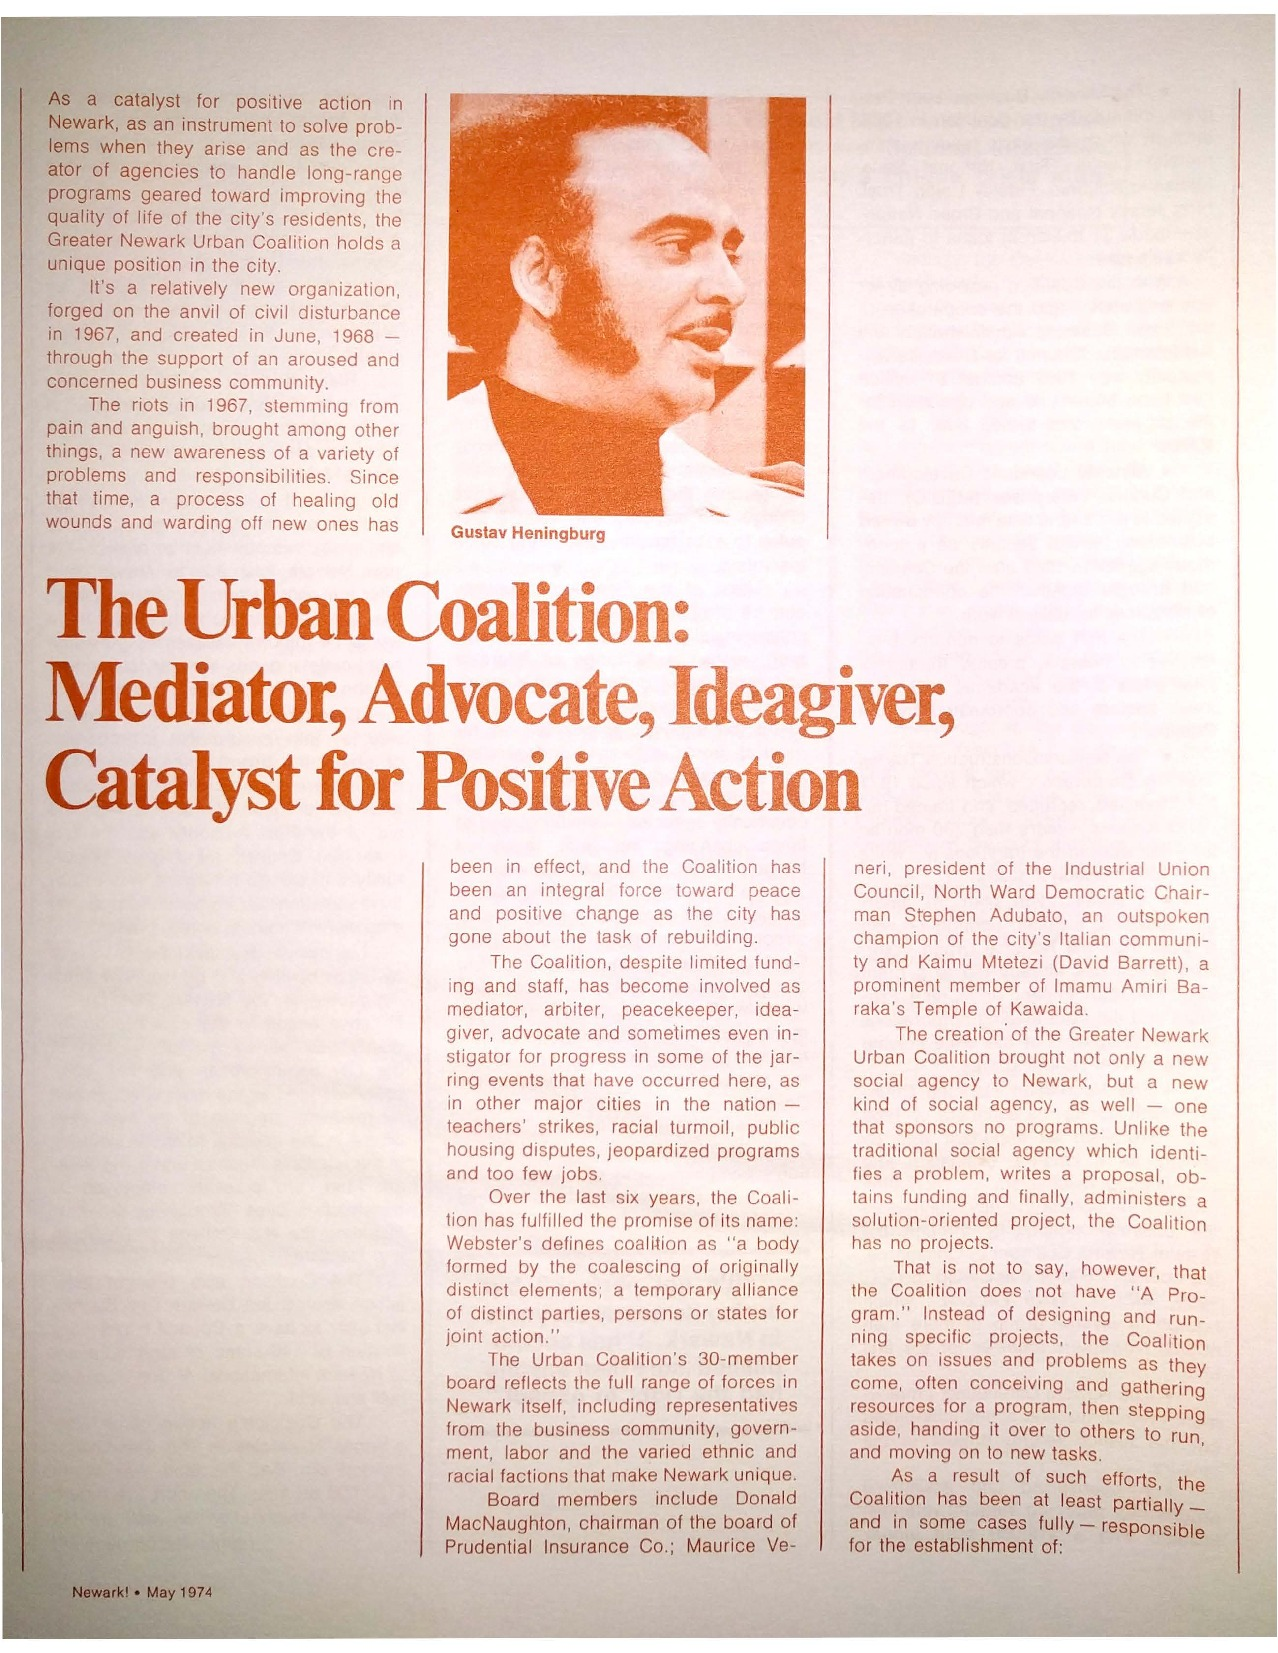 The Urban Coalition (1974)